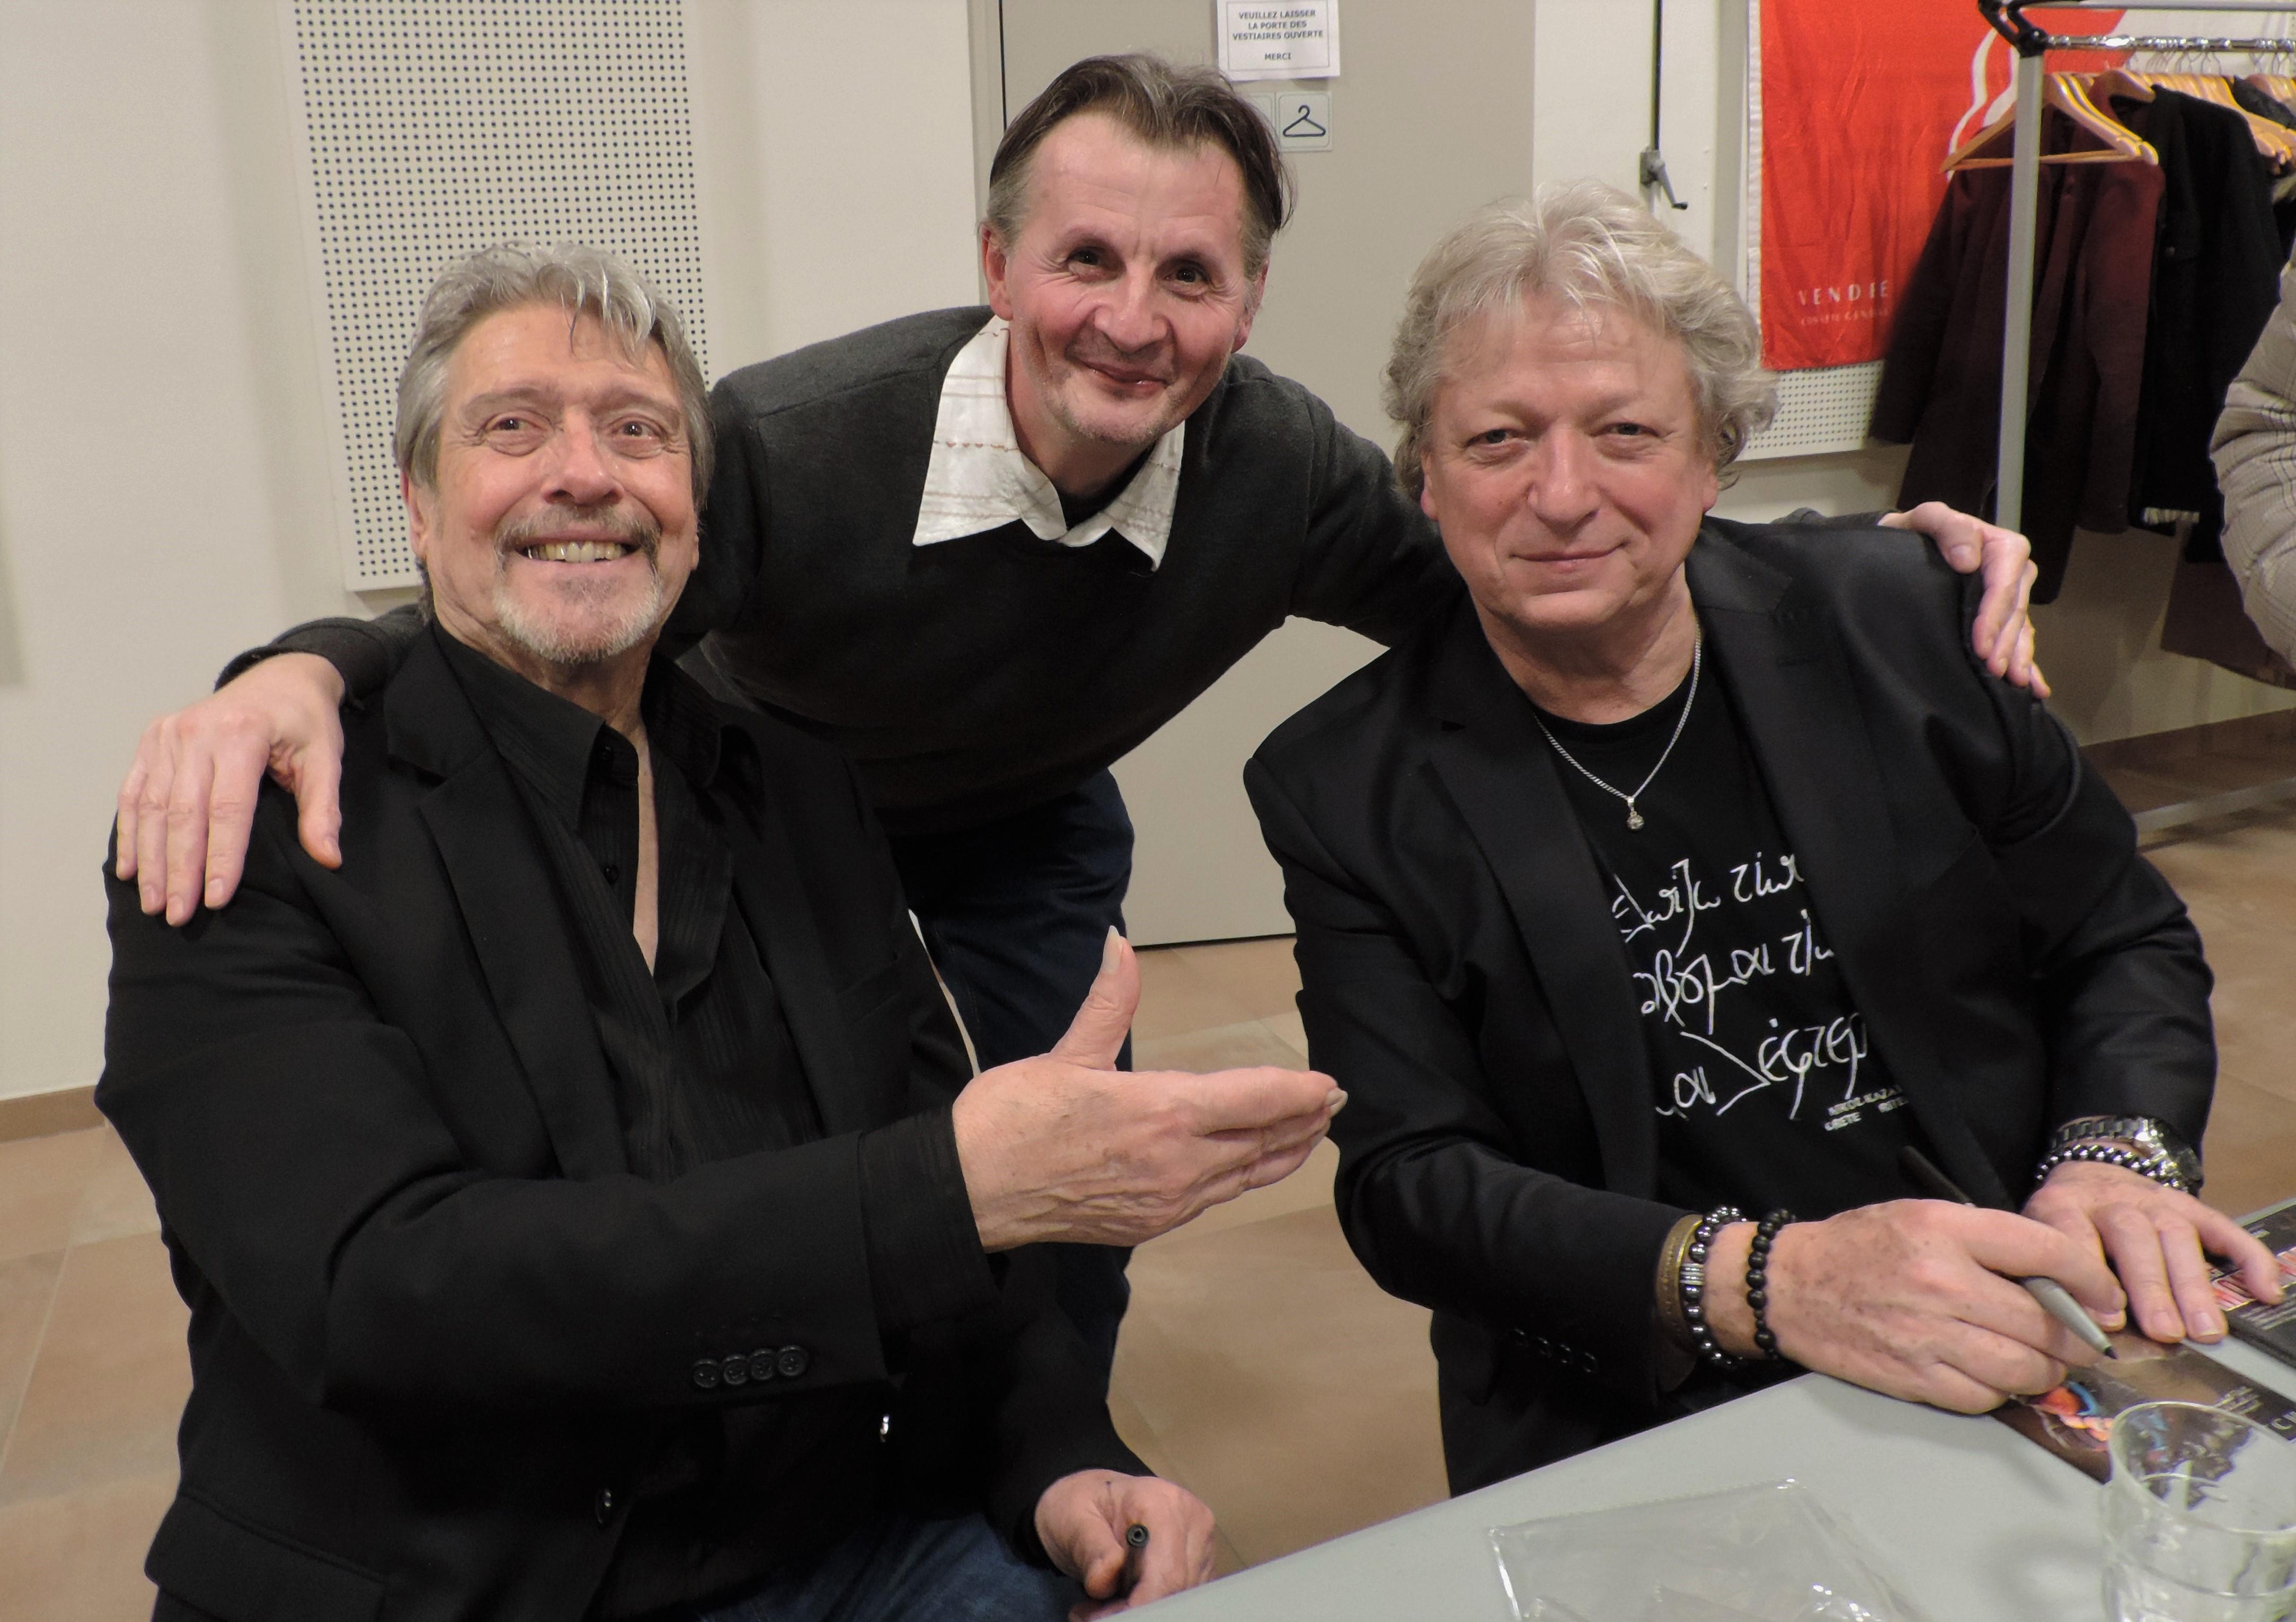 avec Gilles Dreu et Alain Turban